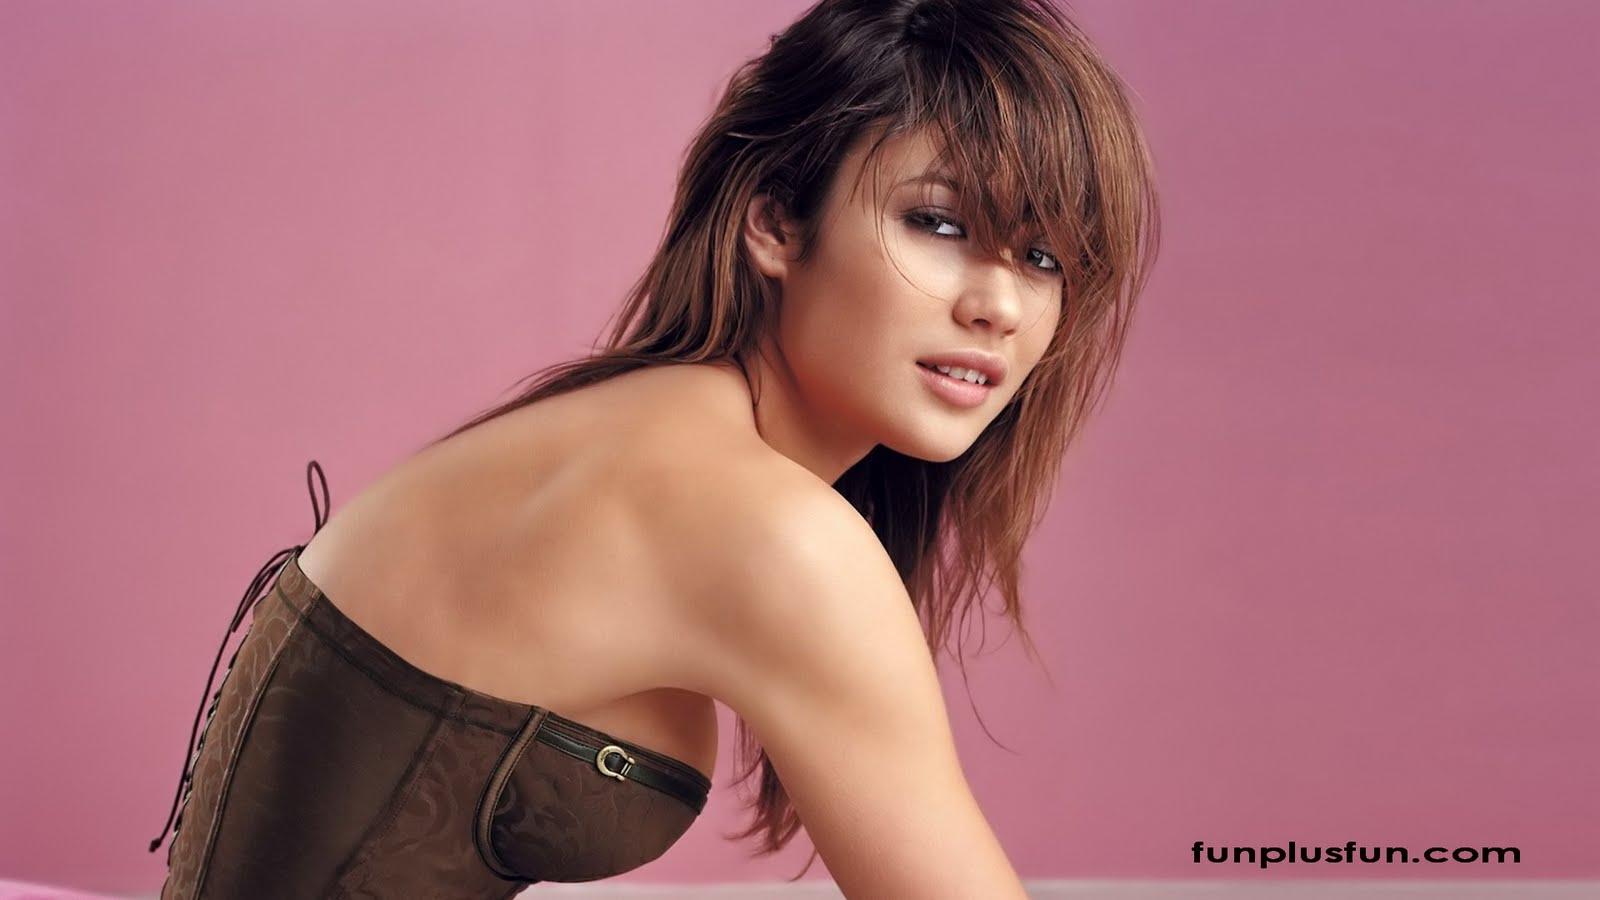 http://4.bp.blogspot.com/-ojLVywyQgpo/TjEb5CbSbdI/AAAAAAAABC8/e5fCsSUtFyU/s1600/Hot-Models-Wallpapers5.jpg